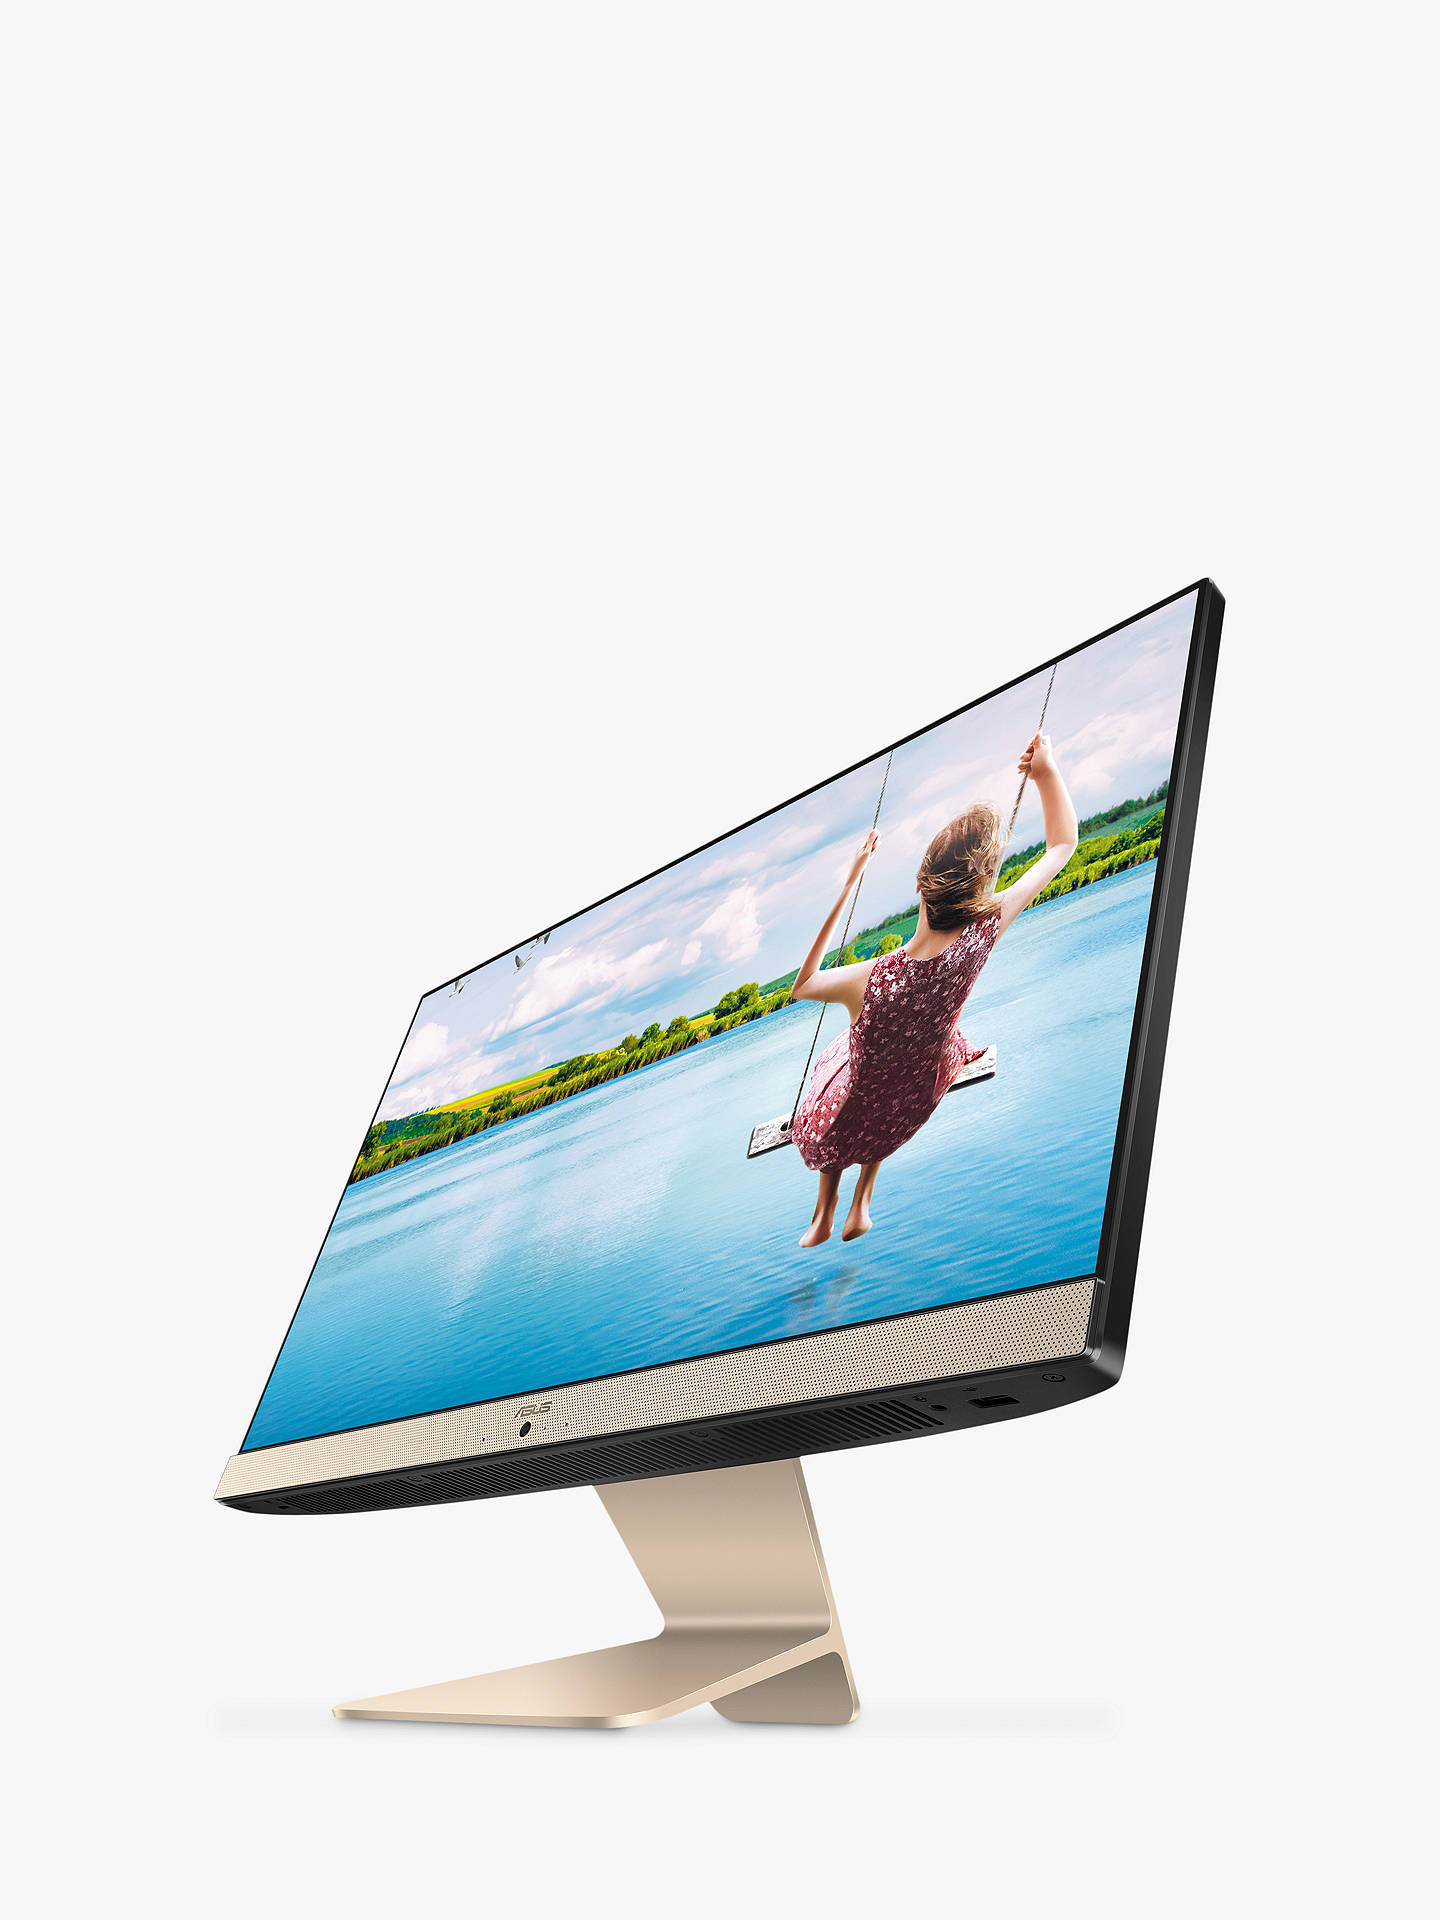 ASUS Vivo V222UAK-BA272T All-in-One Desktop PC, Intel Pentium J5005, 8GB  RAM, 2TB HDD, 21 5